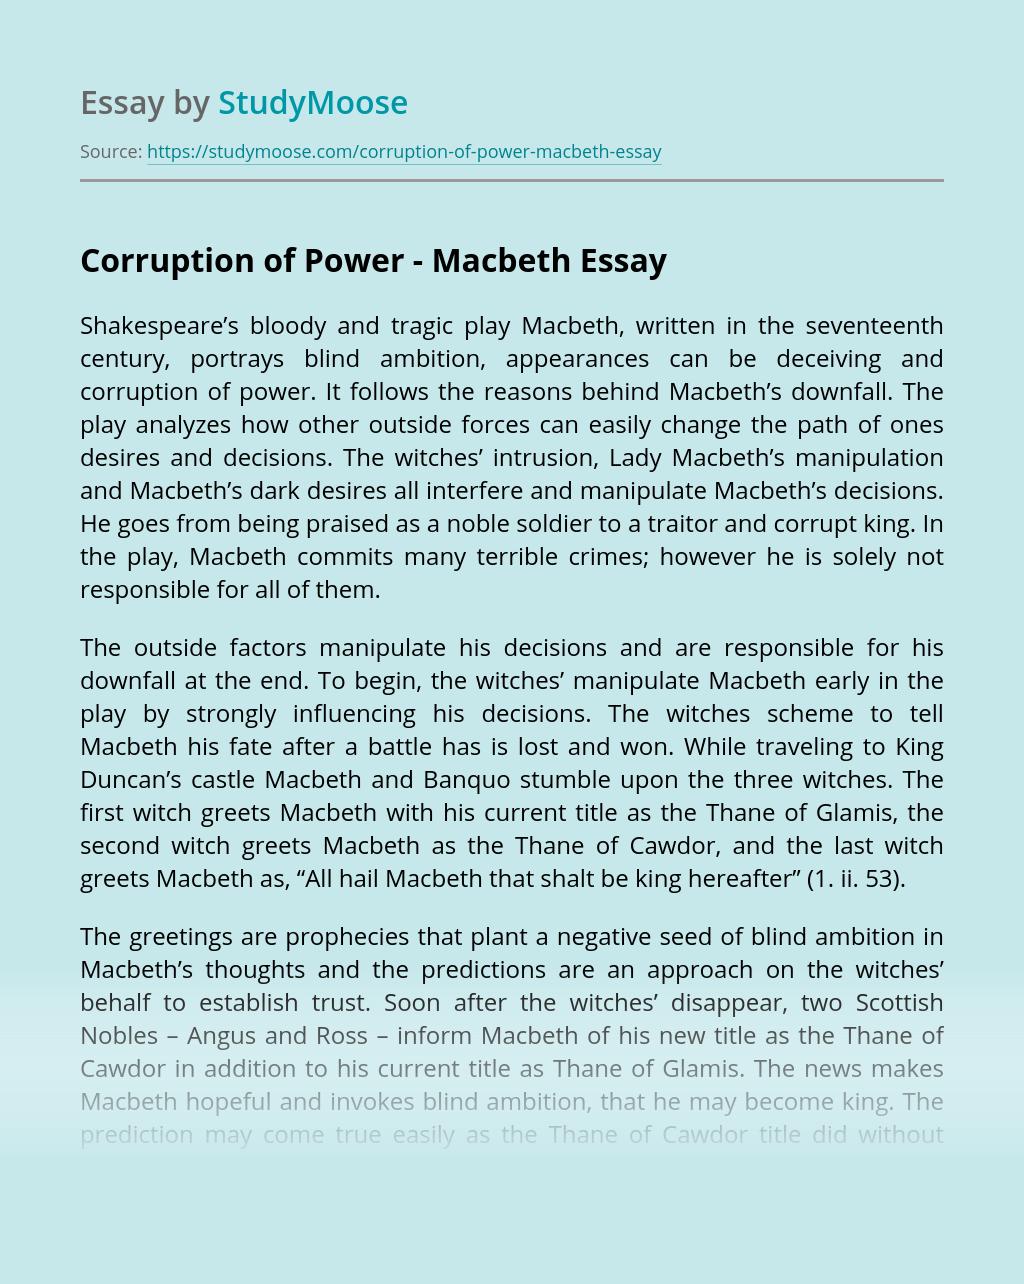 Corruption of Power - Macbeth